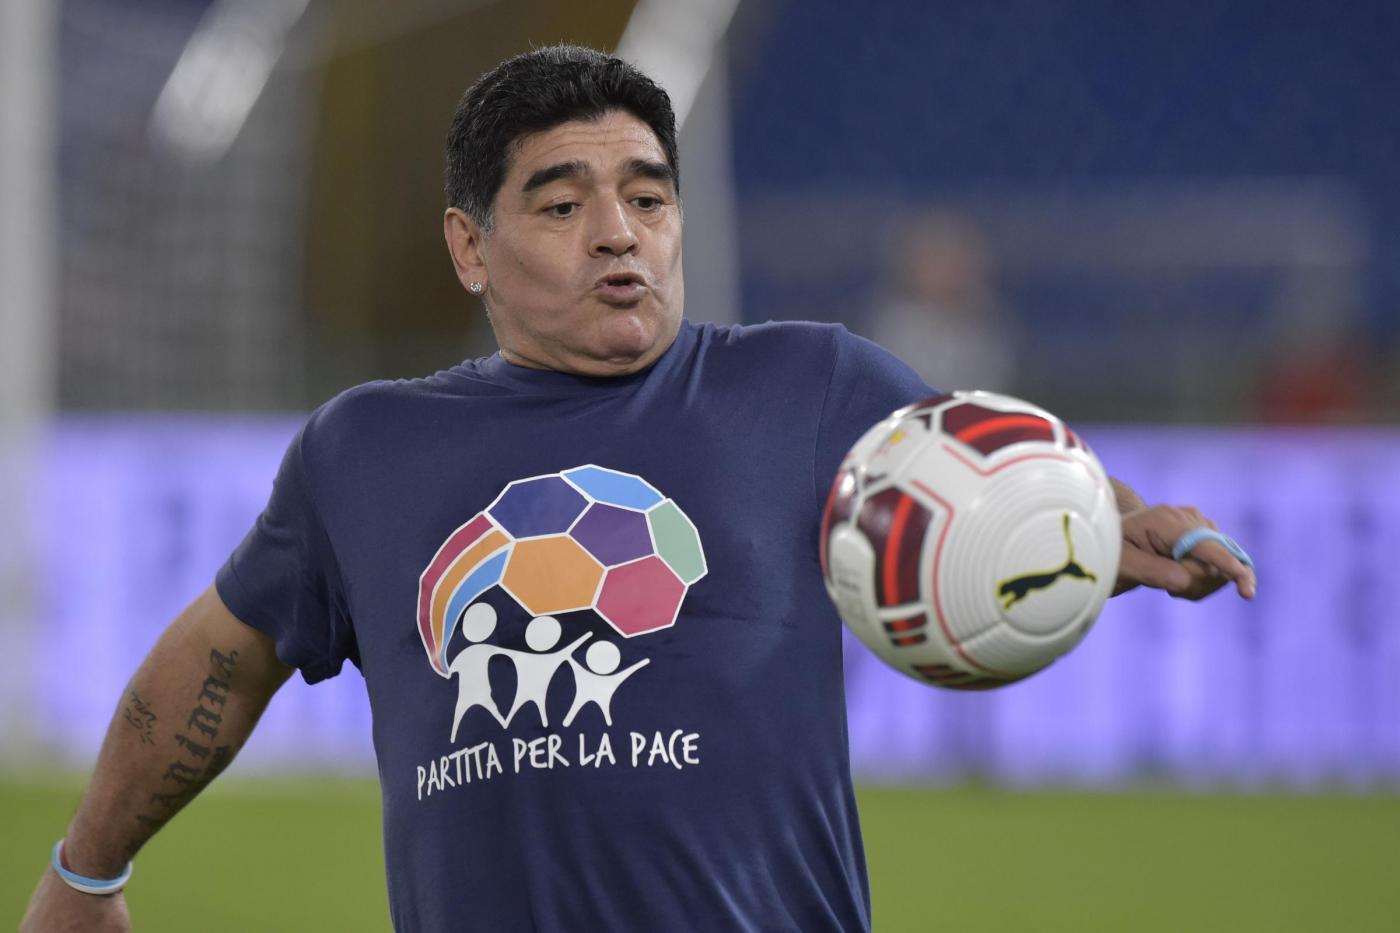 Diego Armando Maradona compie 55 anni